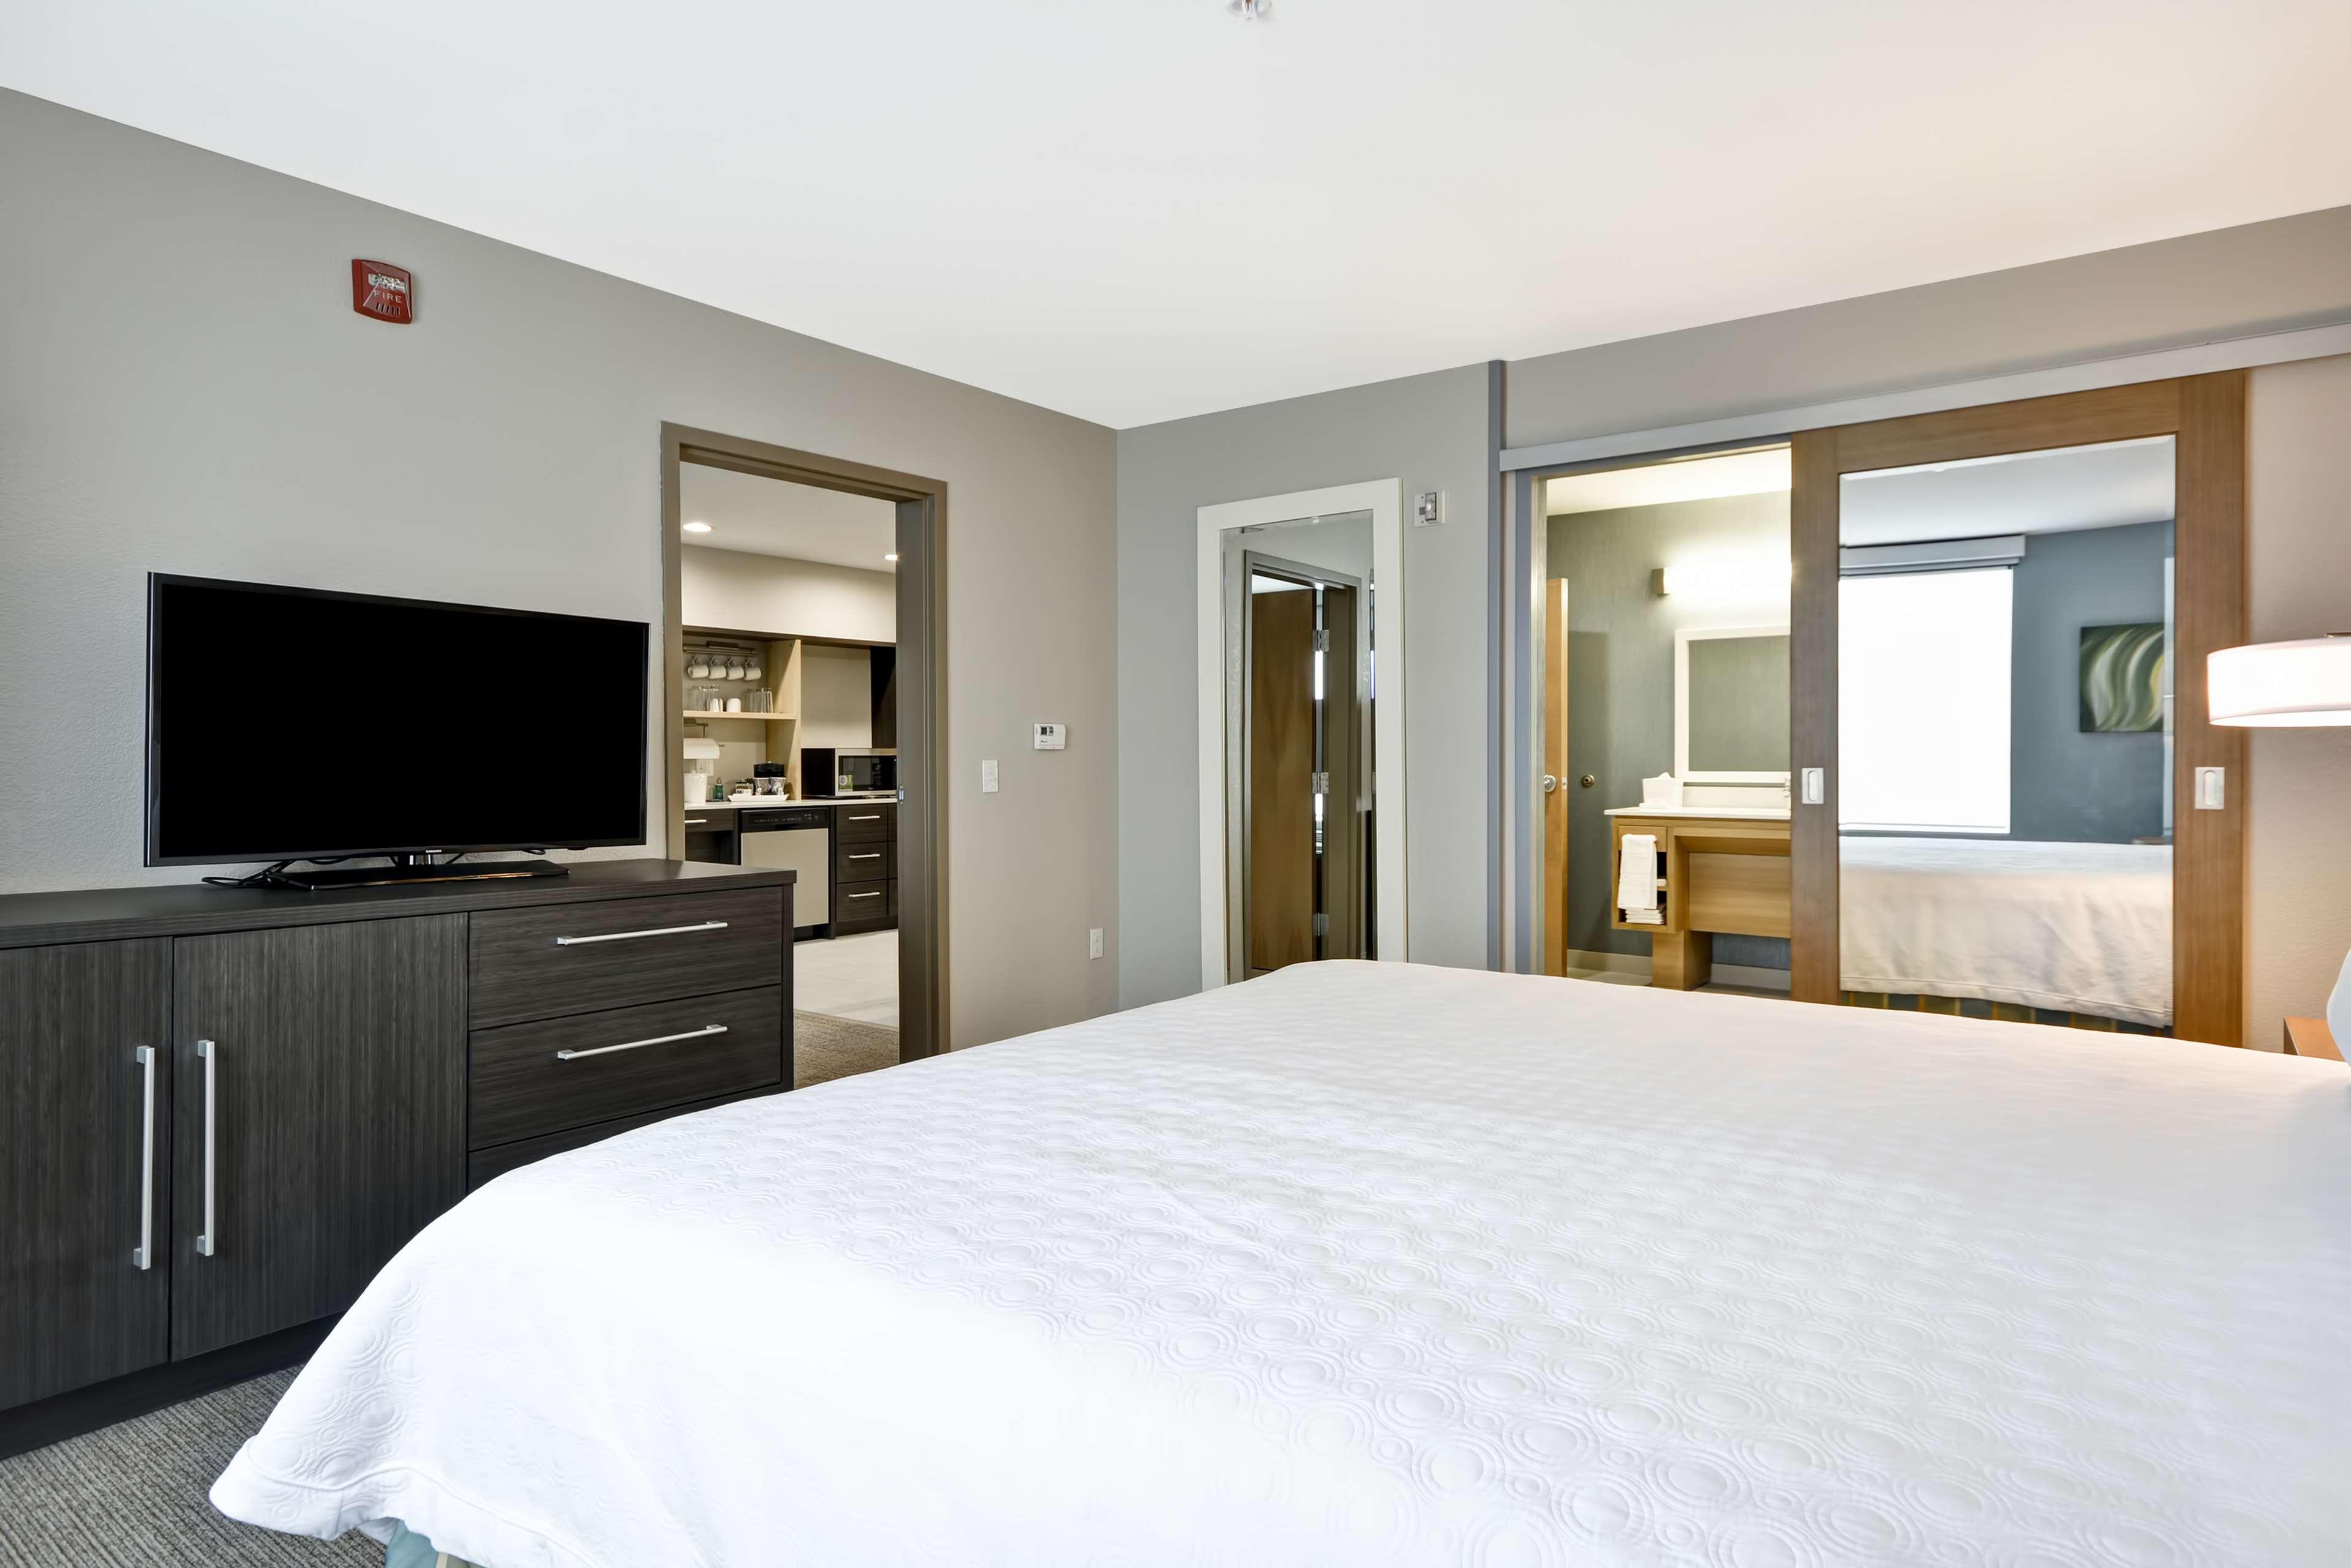 Home2 Suites by Hilton Jackson image 15